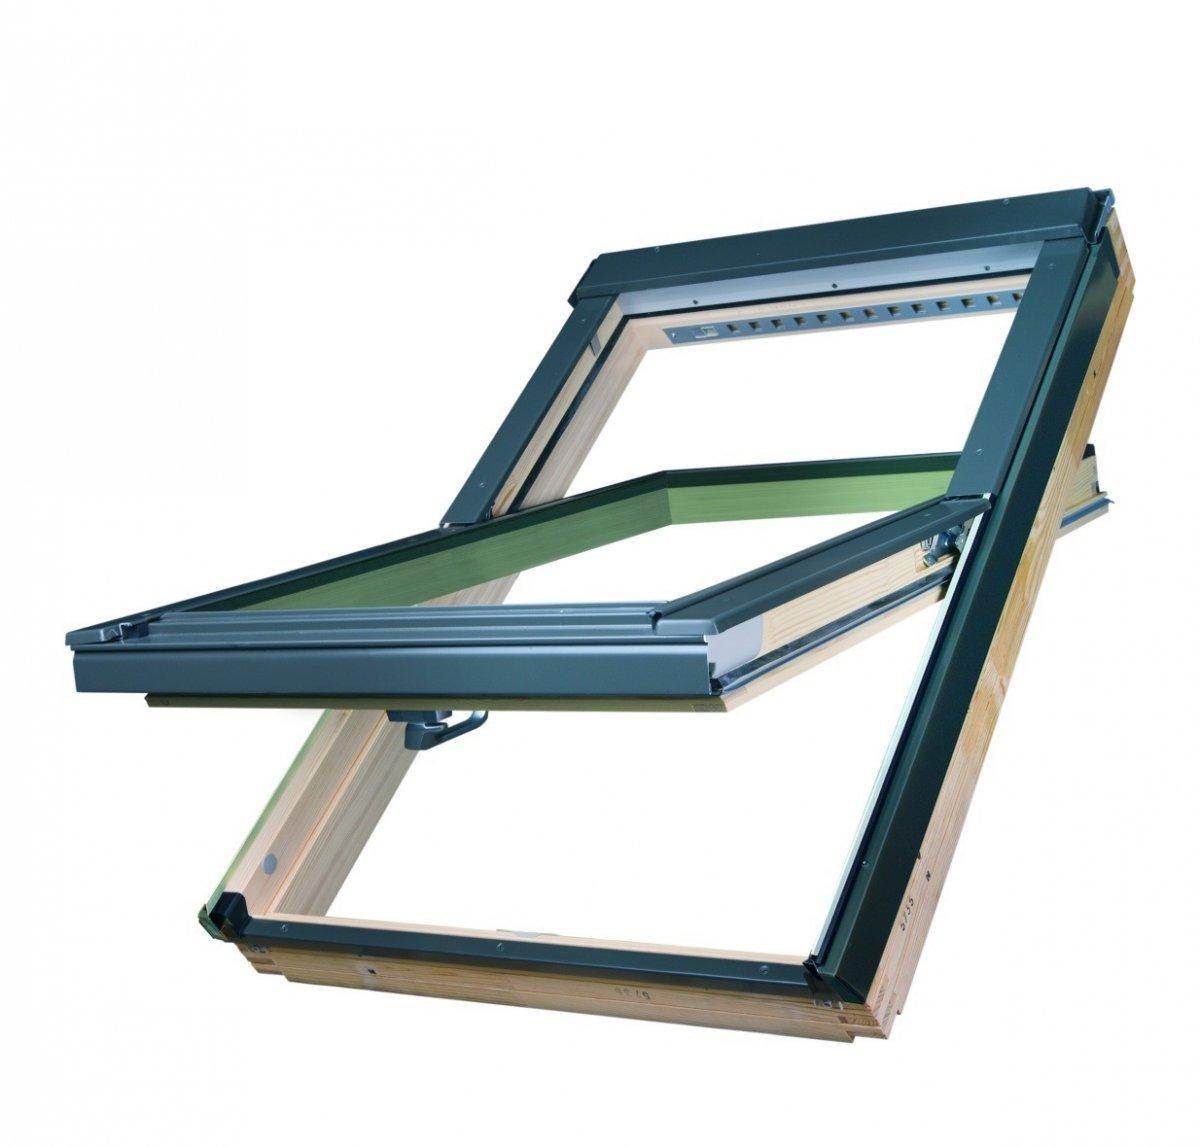 Dachfenster fakro ftp v u4 3 fach verglasung - Dachfenster 3 fach verglasung ...